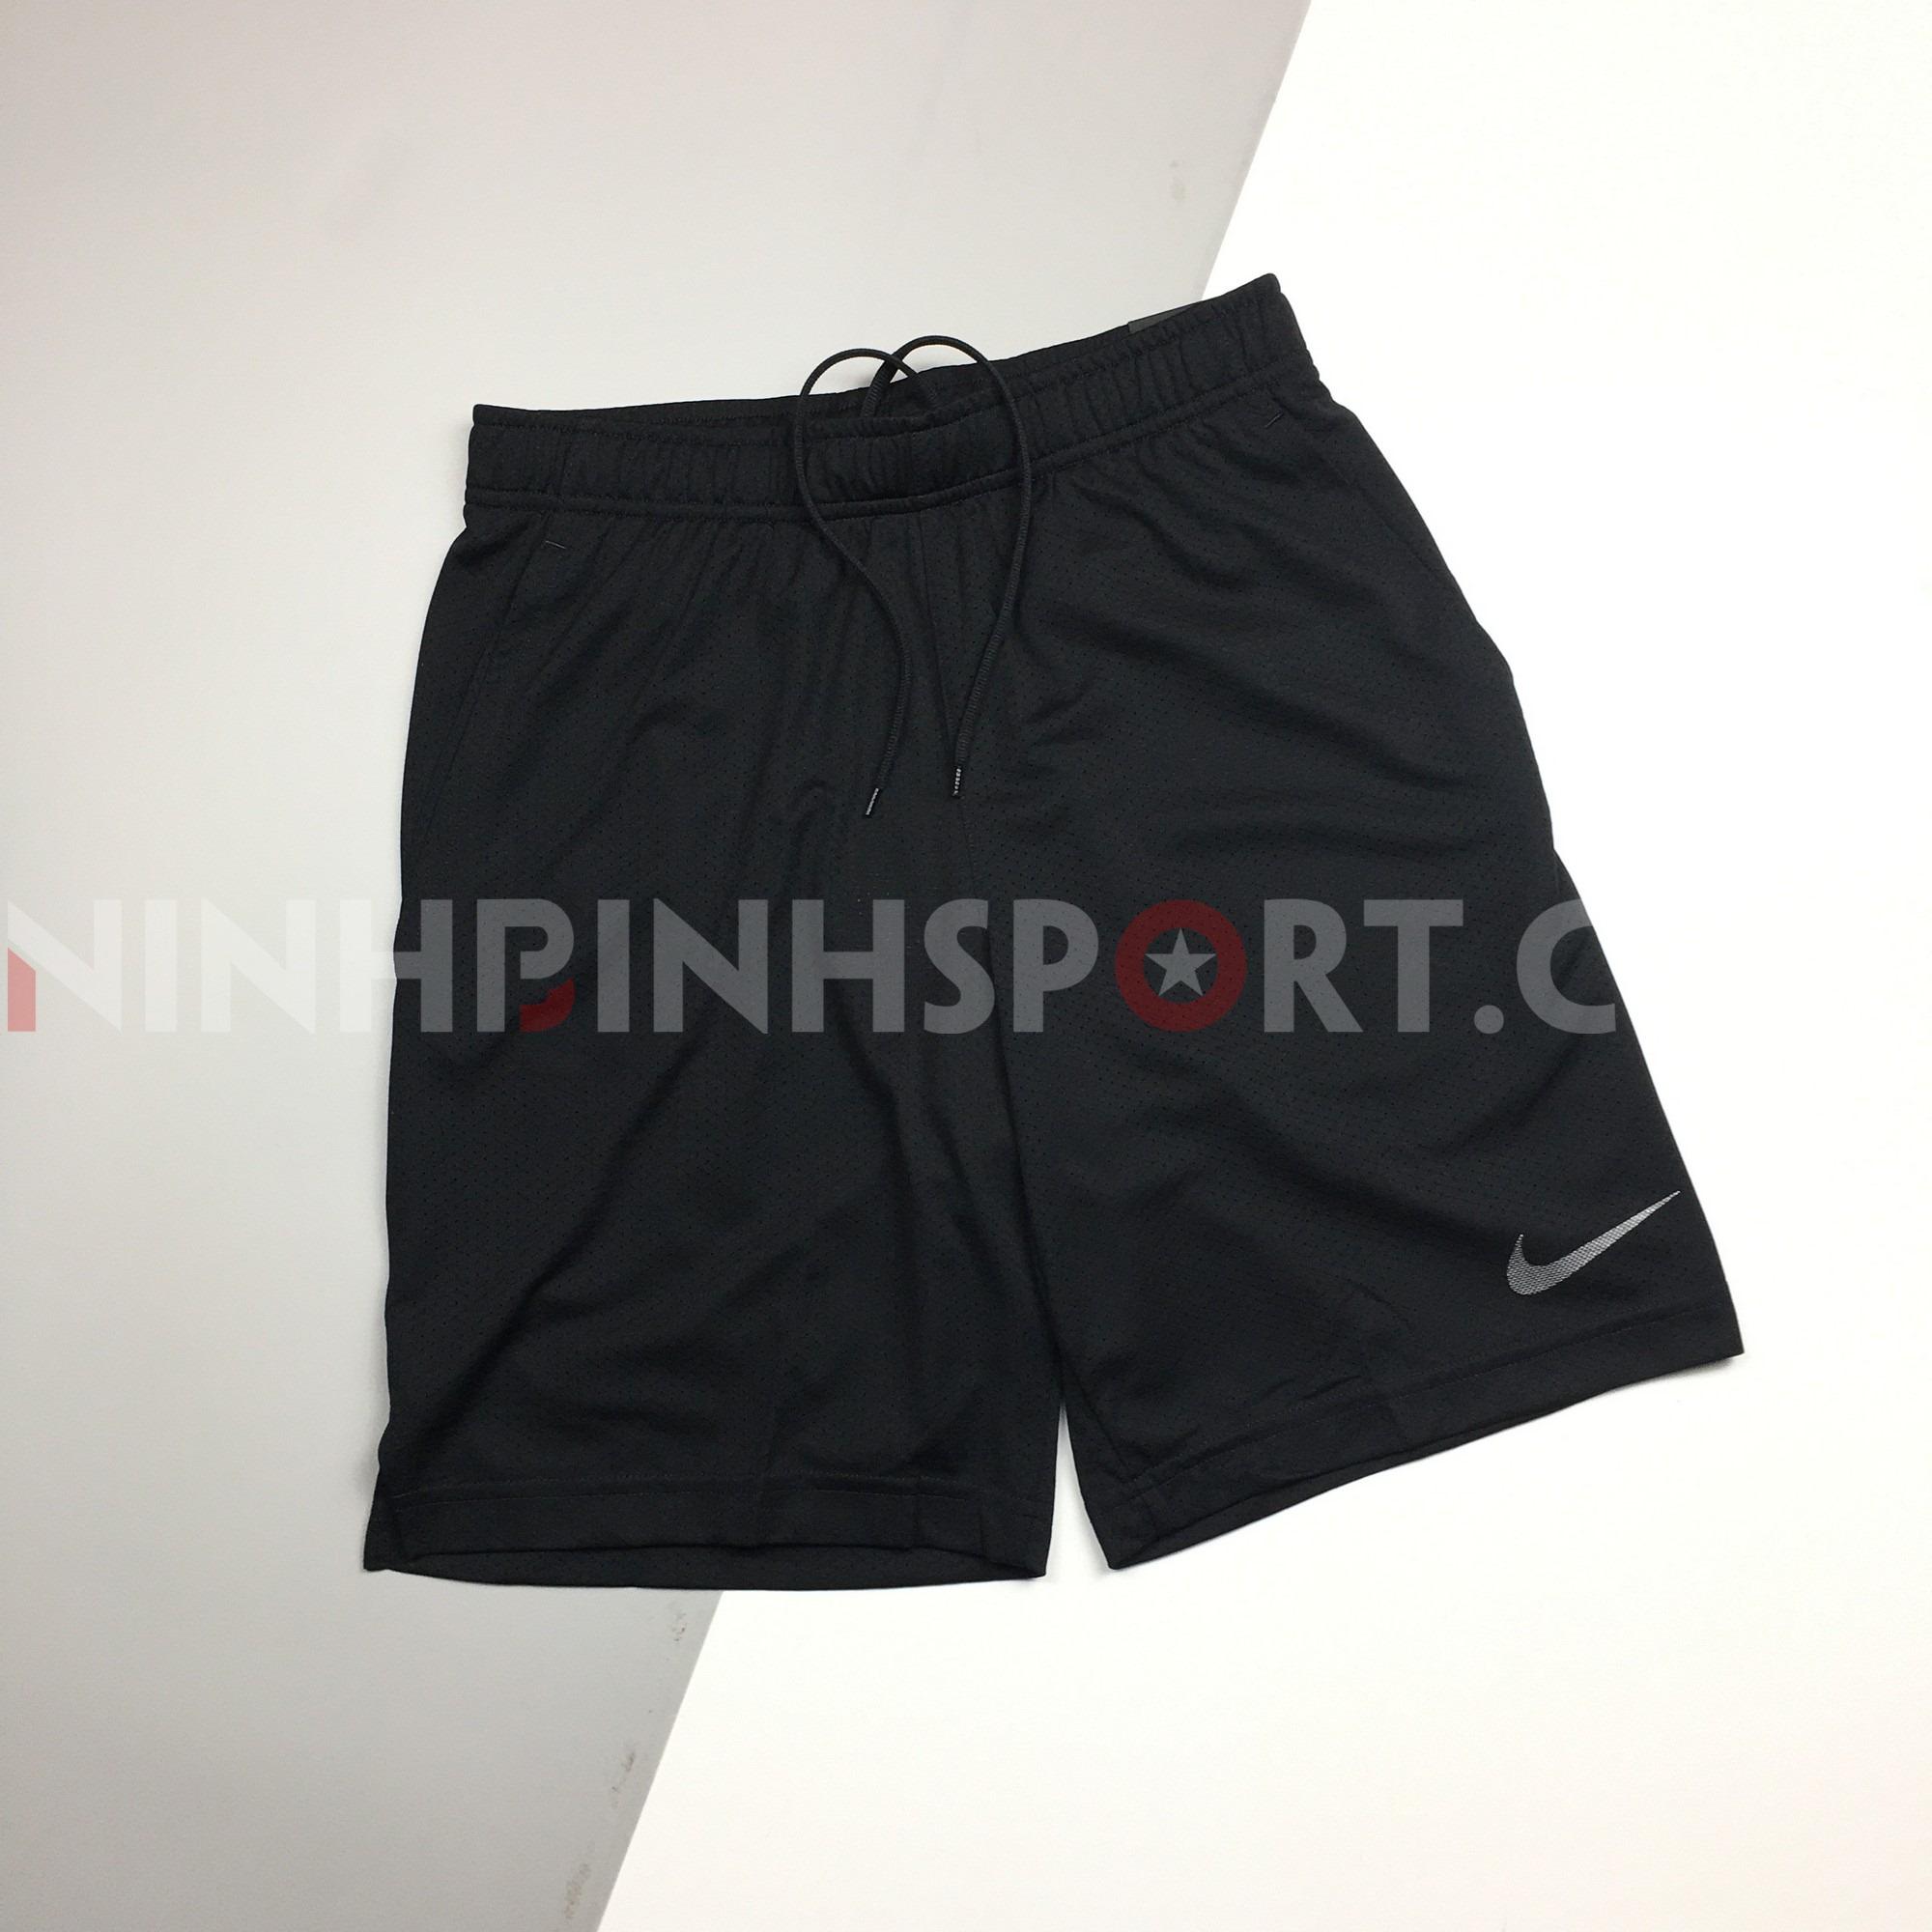 Quần thể thao nam Nike Mesh 4.0 927546-010